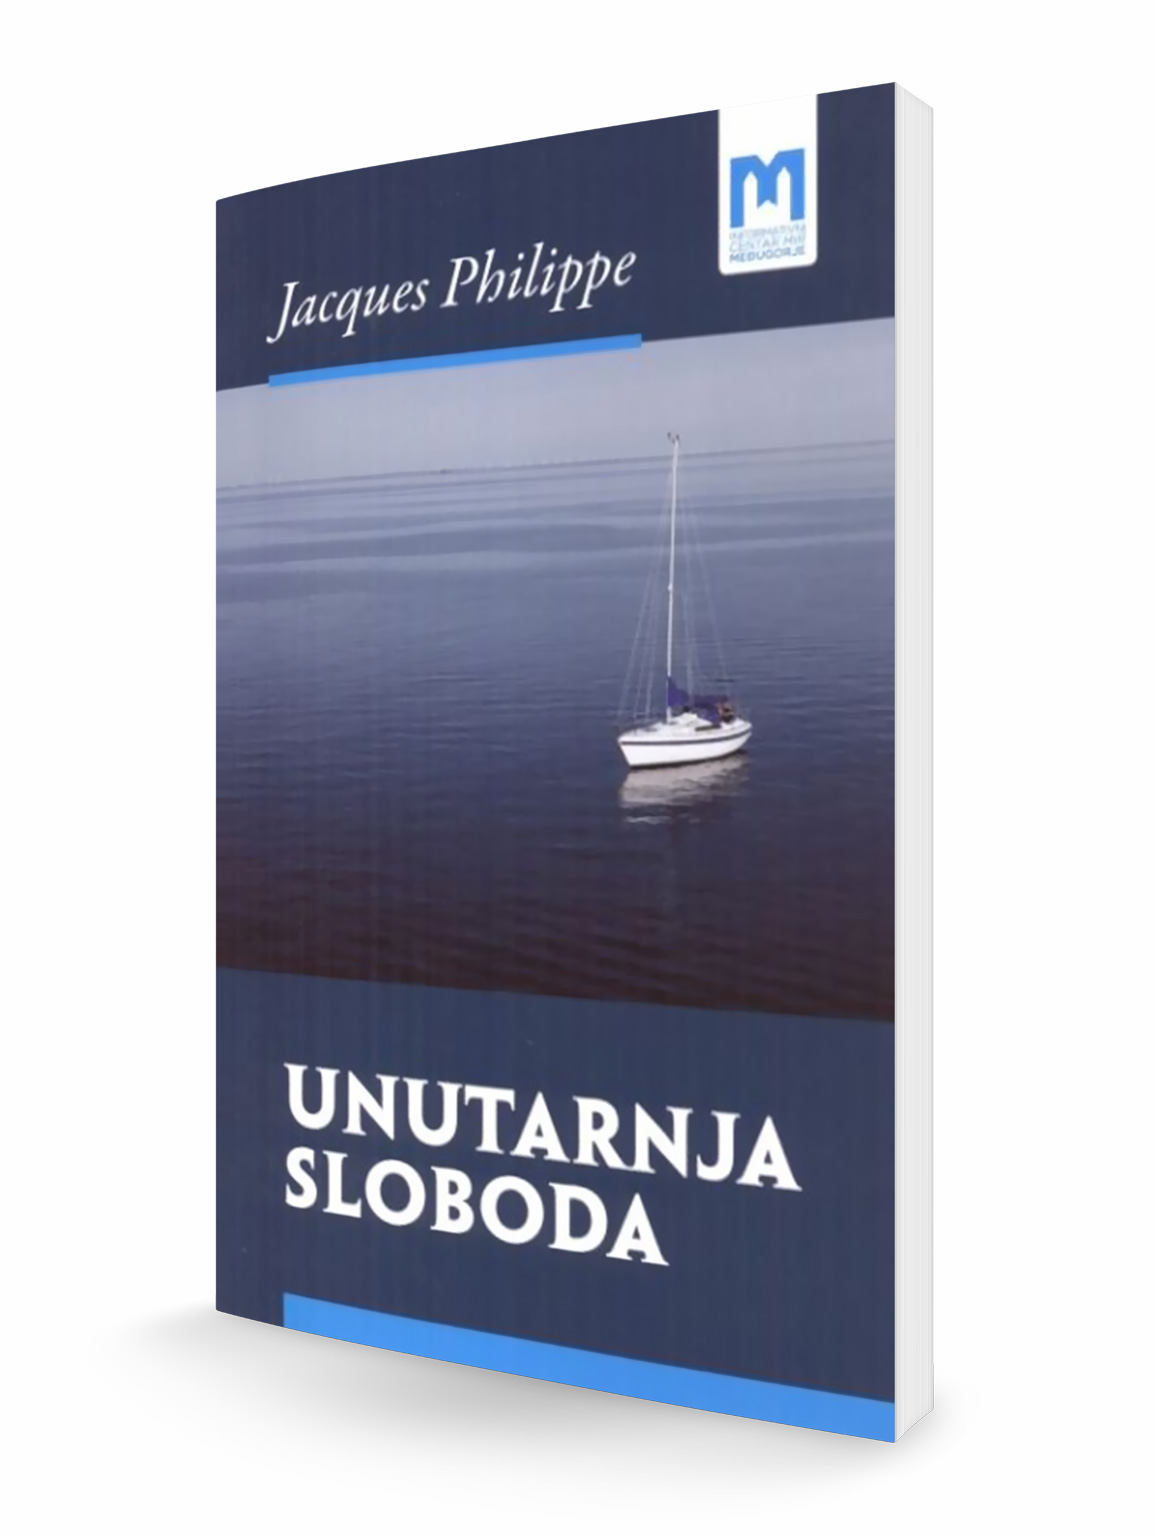 UNUTARNJA SLOBODA - Jacques Philippe